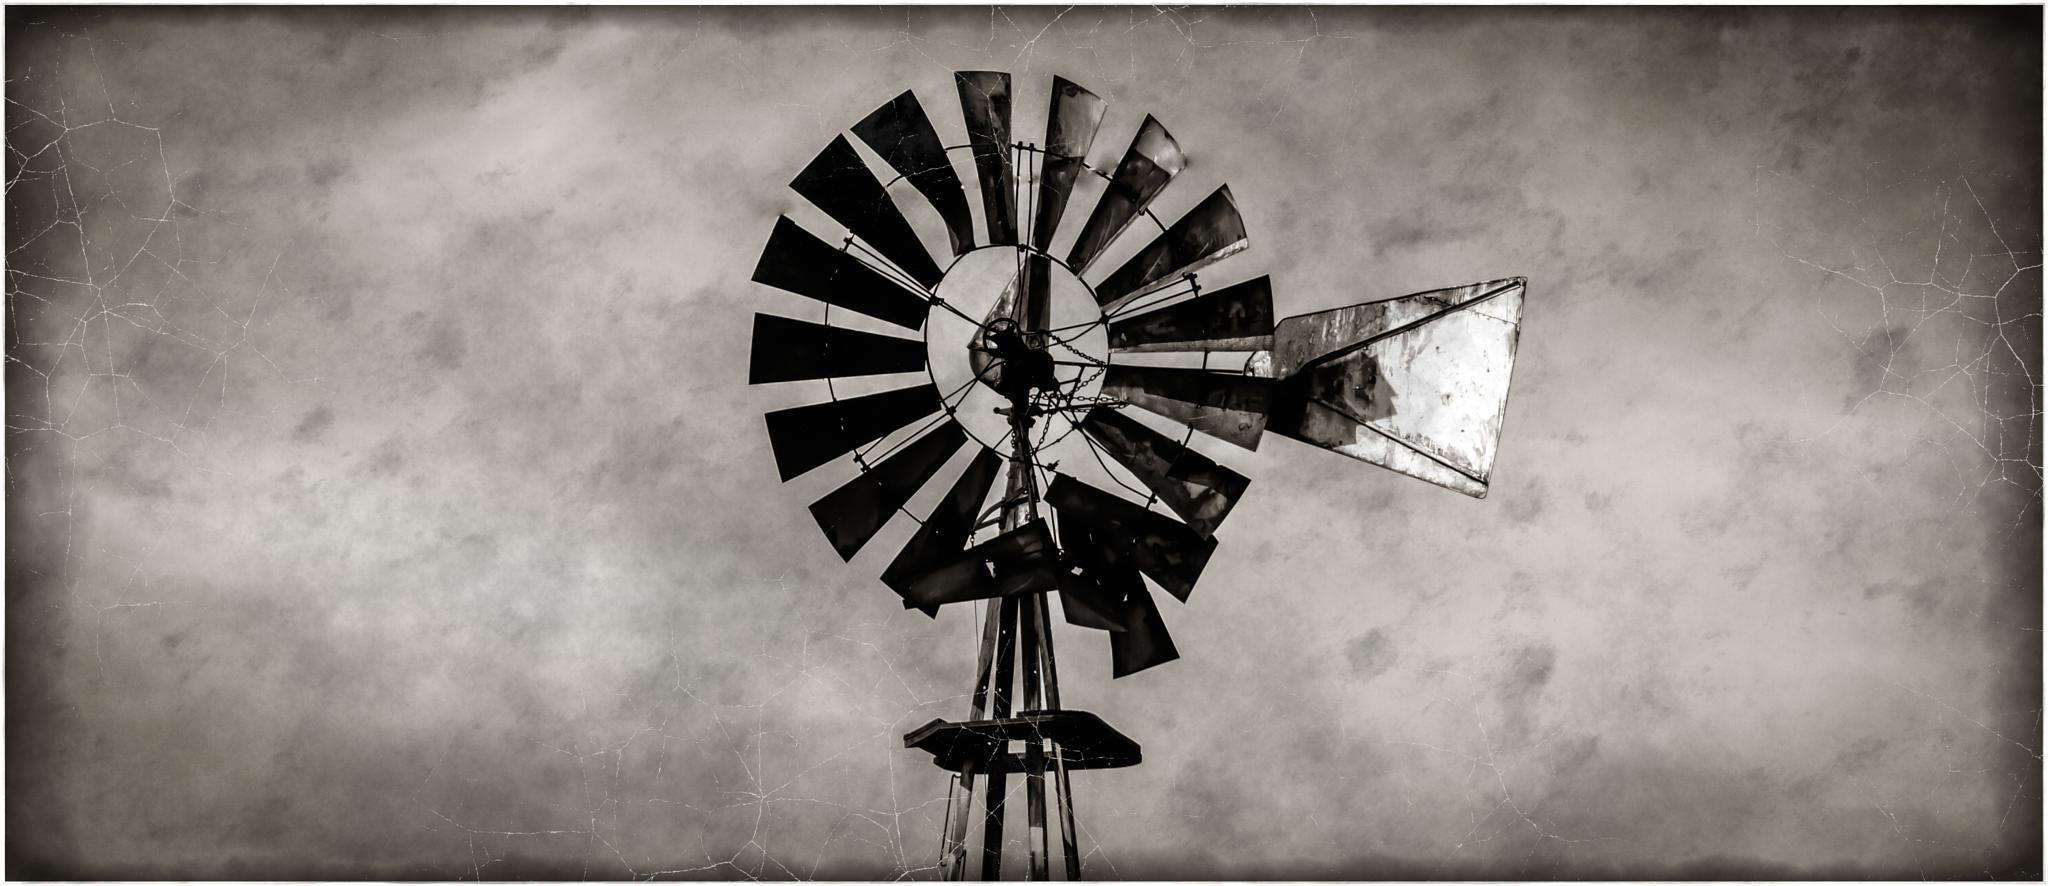 Aged Windmill by douglas.hamilton.984